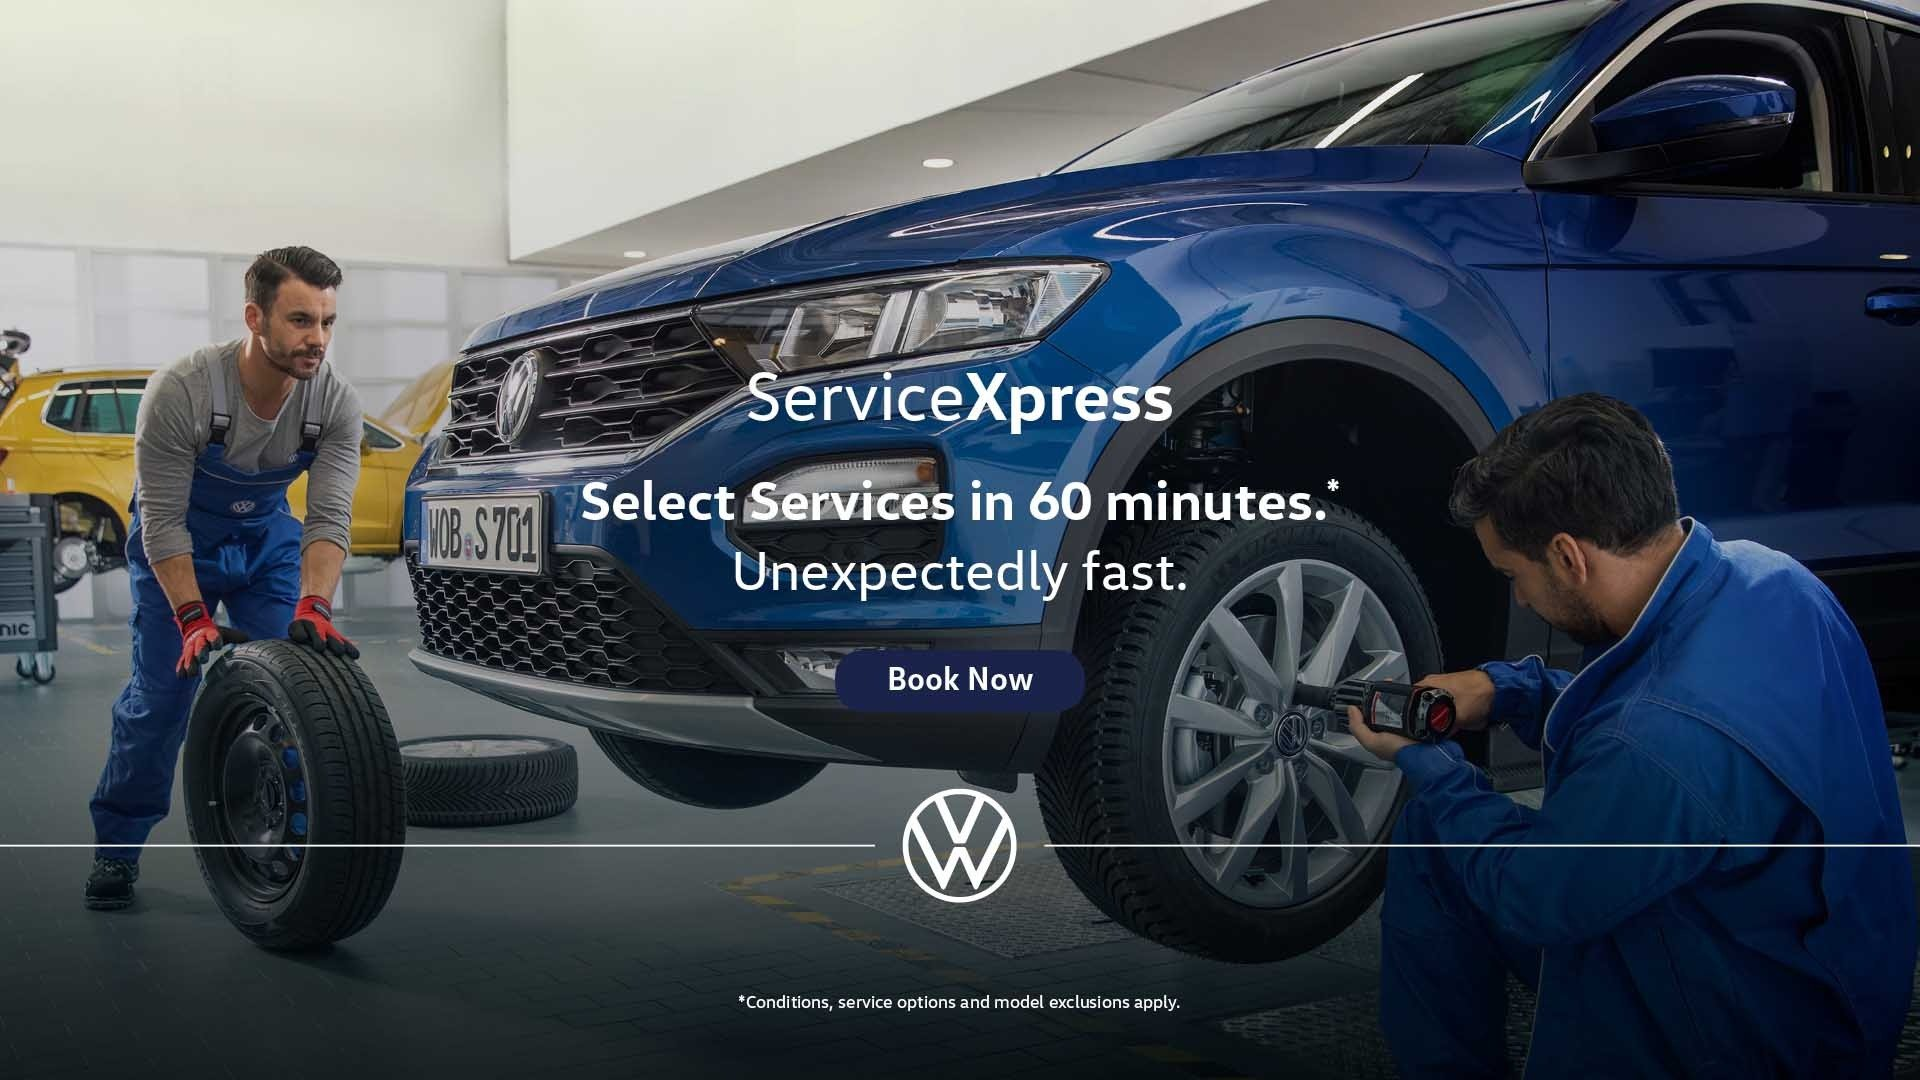 Service Xpress mechanic checking under the bonnet